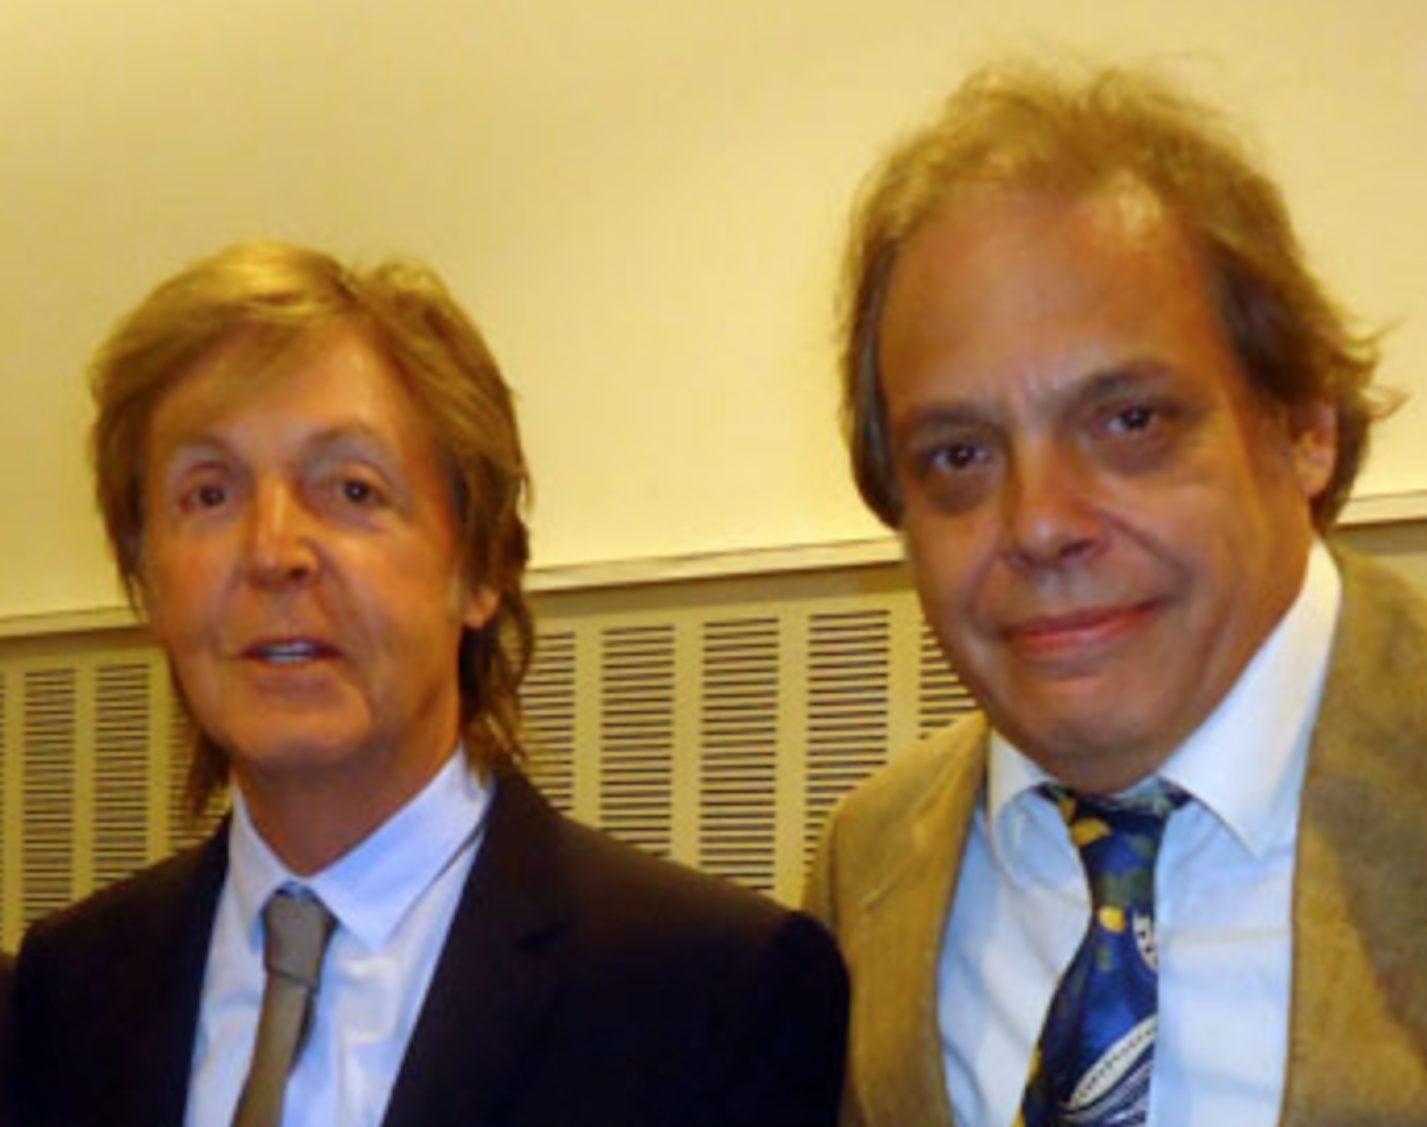 Paul McCartney and David Stark